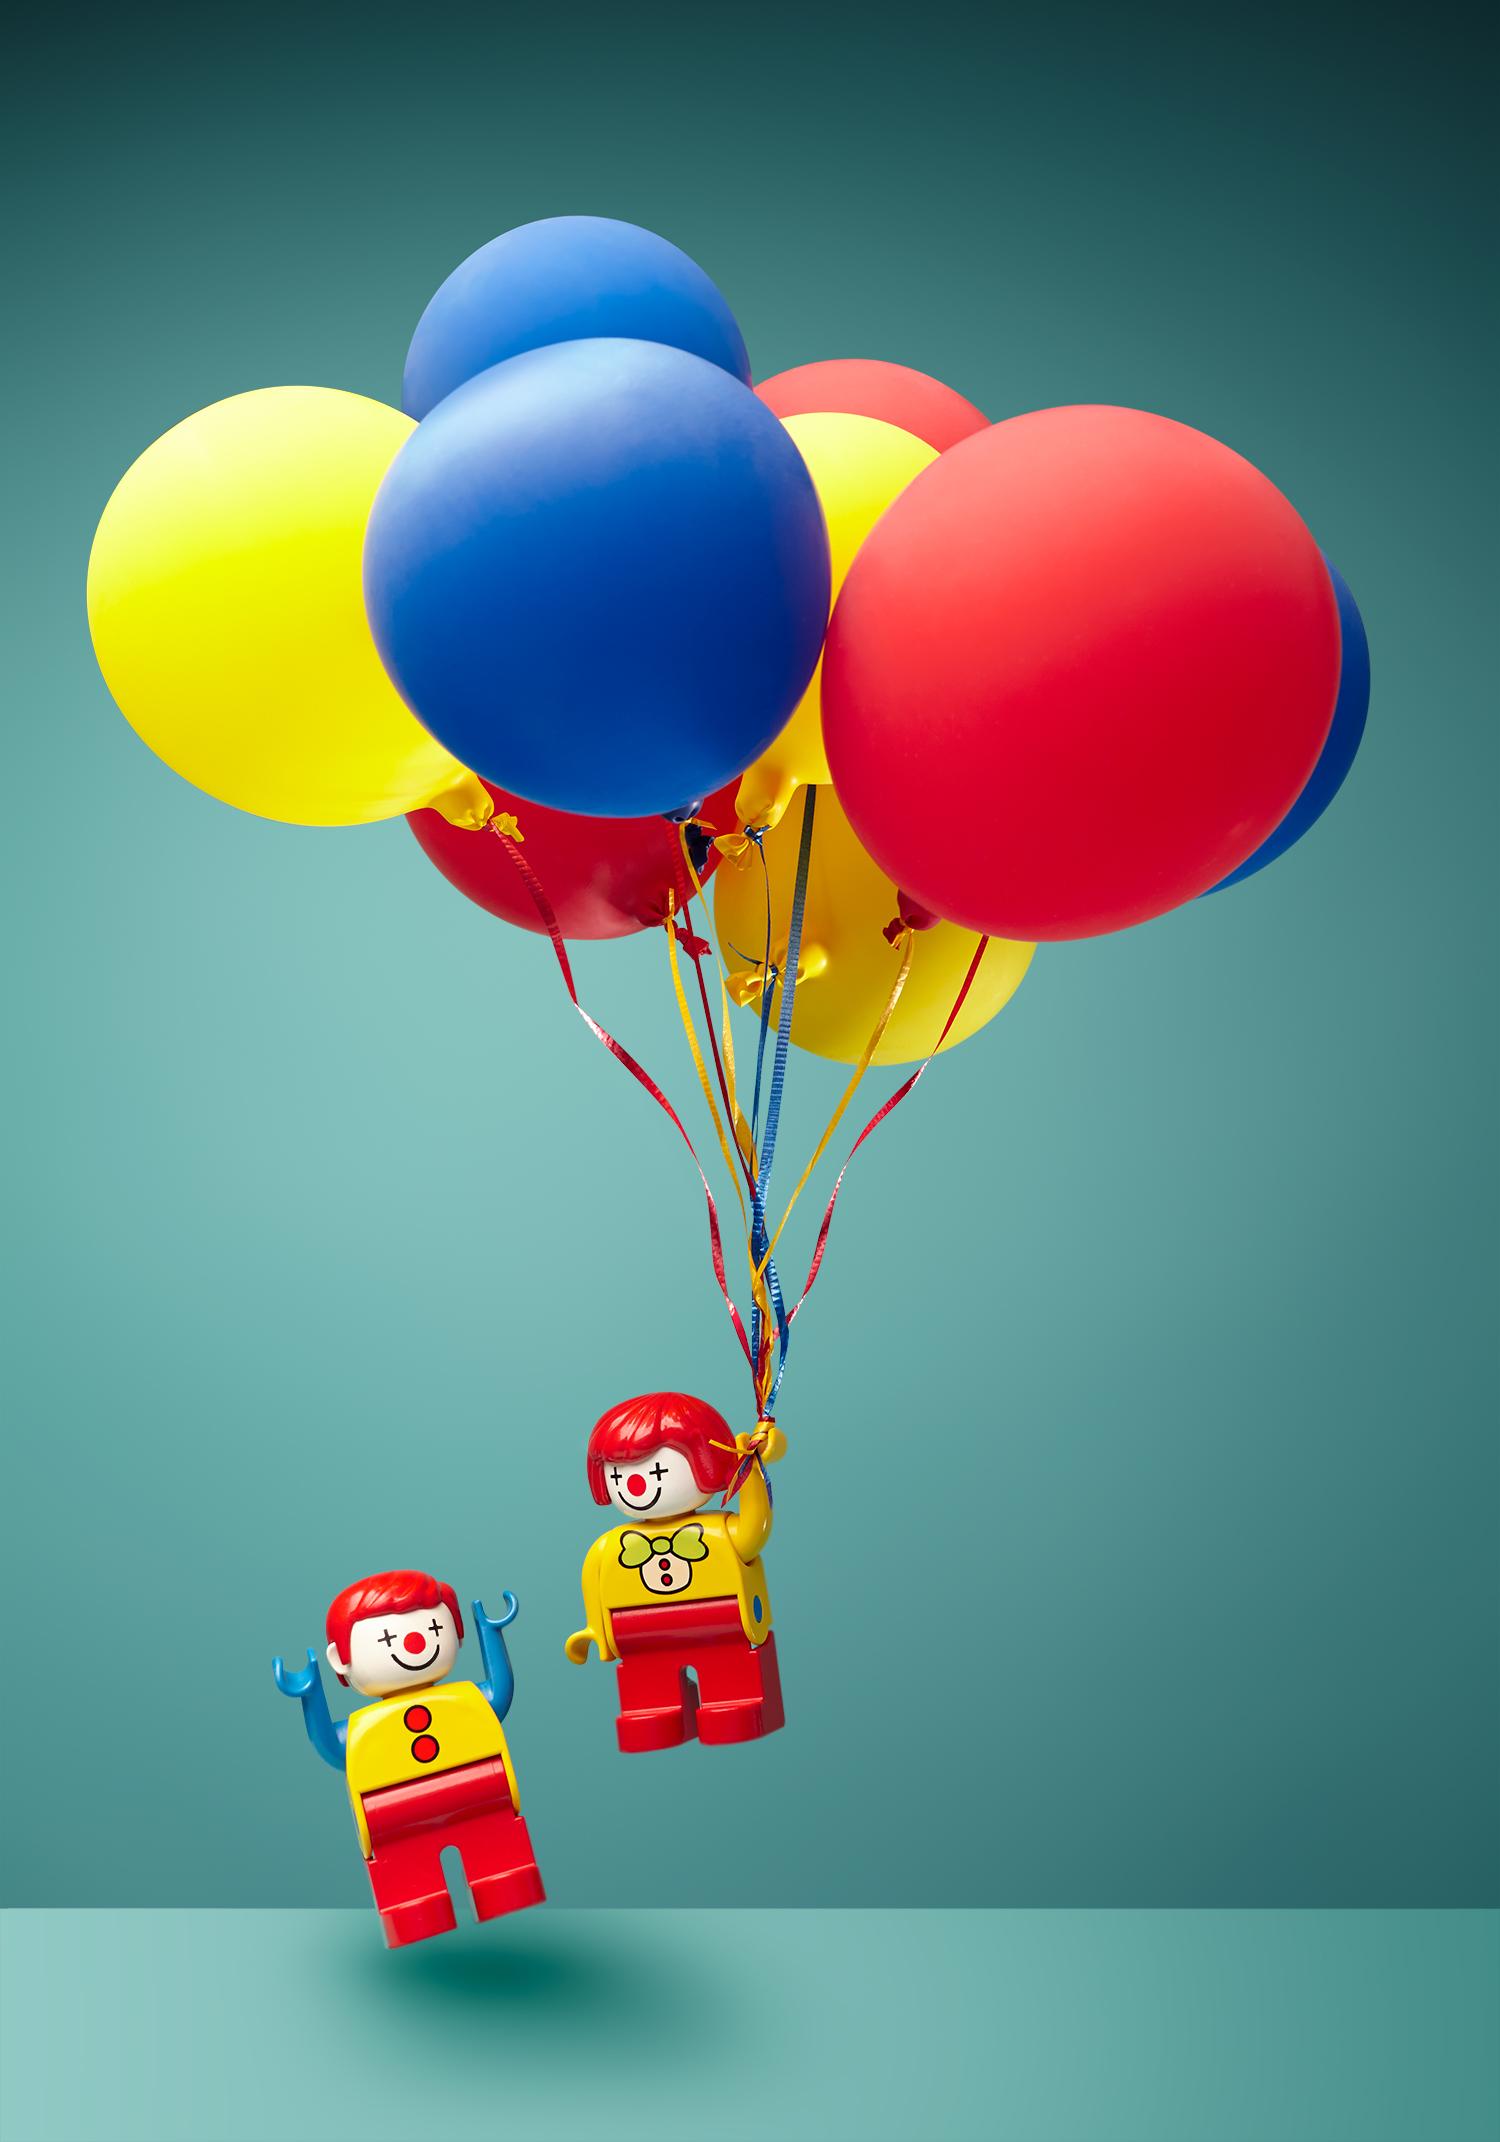 LegoClowns.jpg